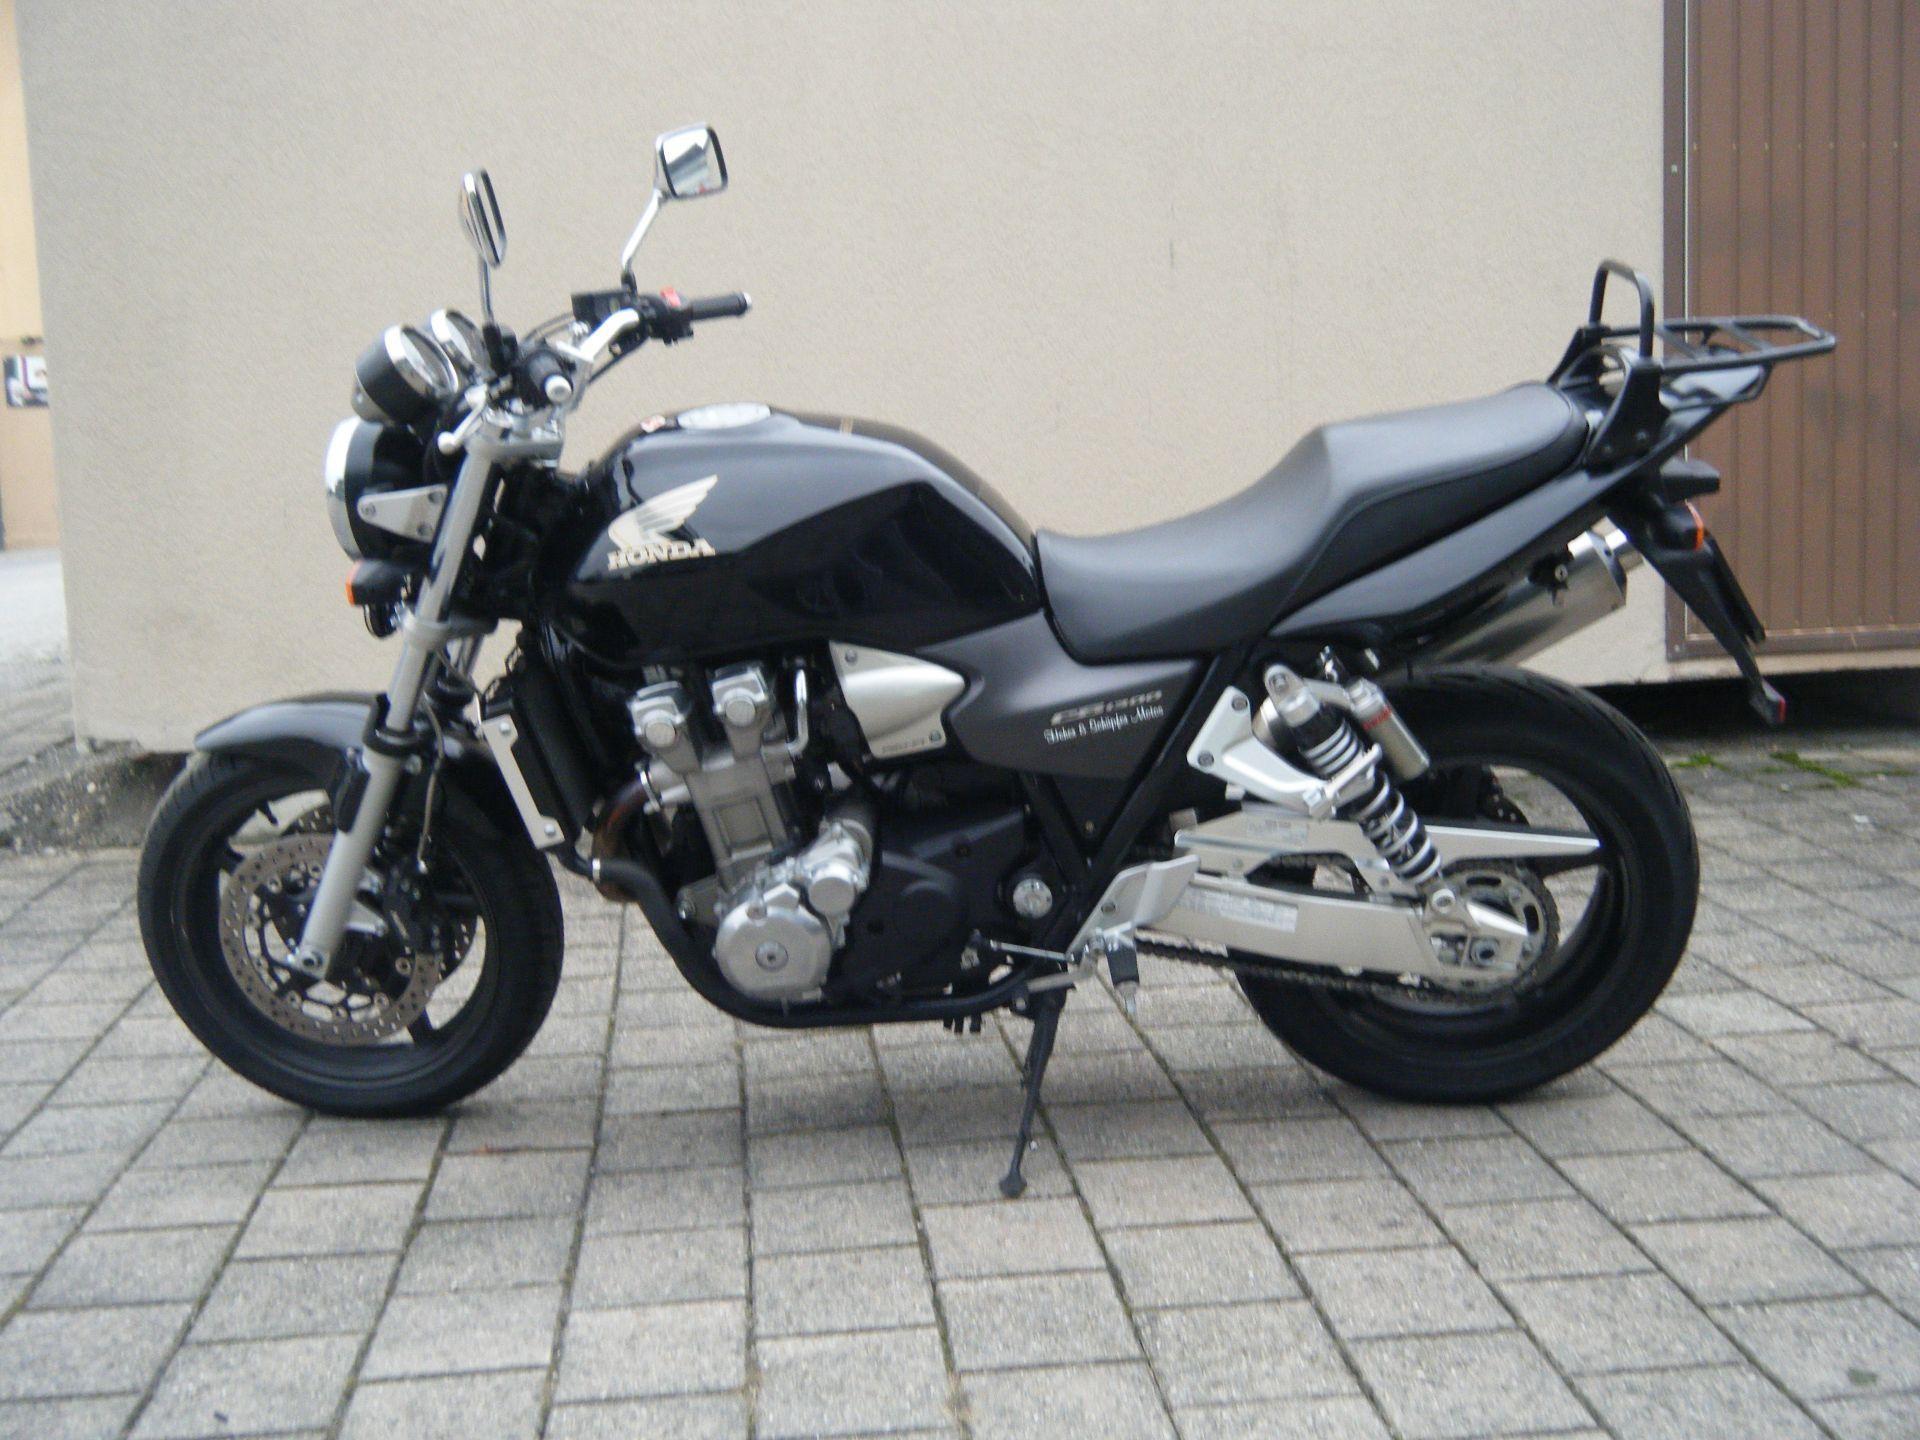 Buy Motorbike Pre Owned Honda Cb 1300 F Heher Schupfer Motos Rickenbach Id 7730611 Zeile 13529